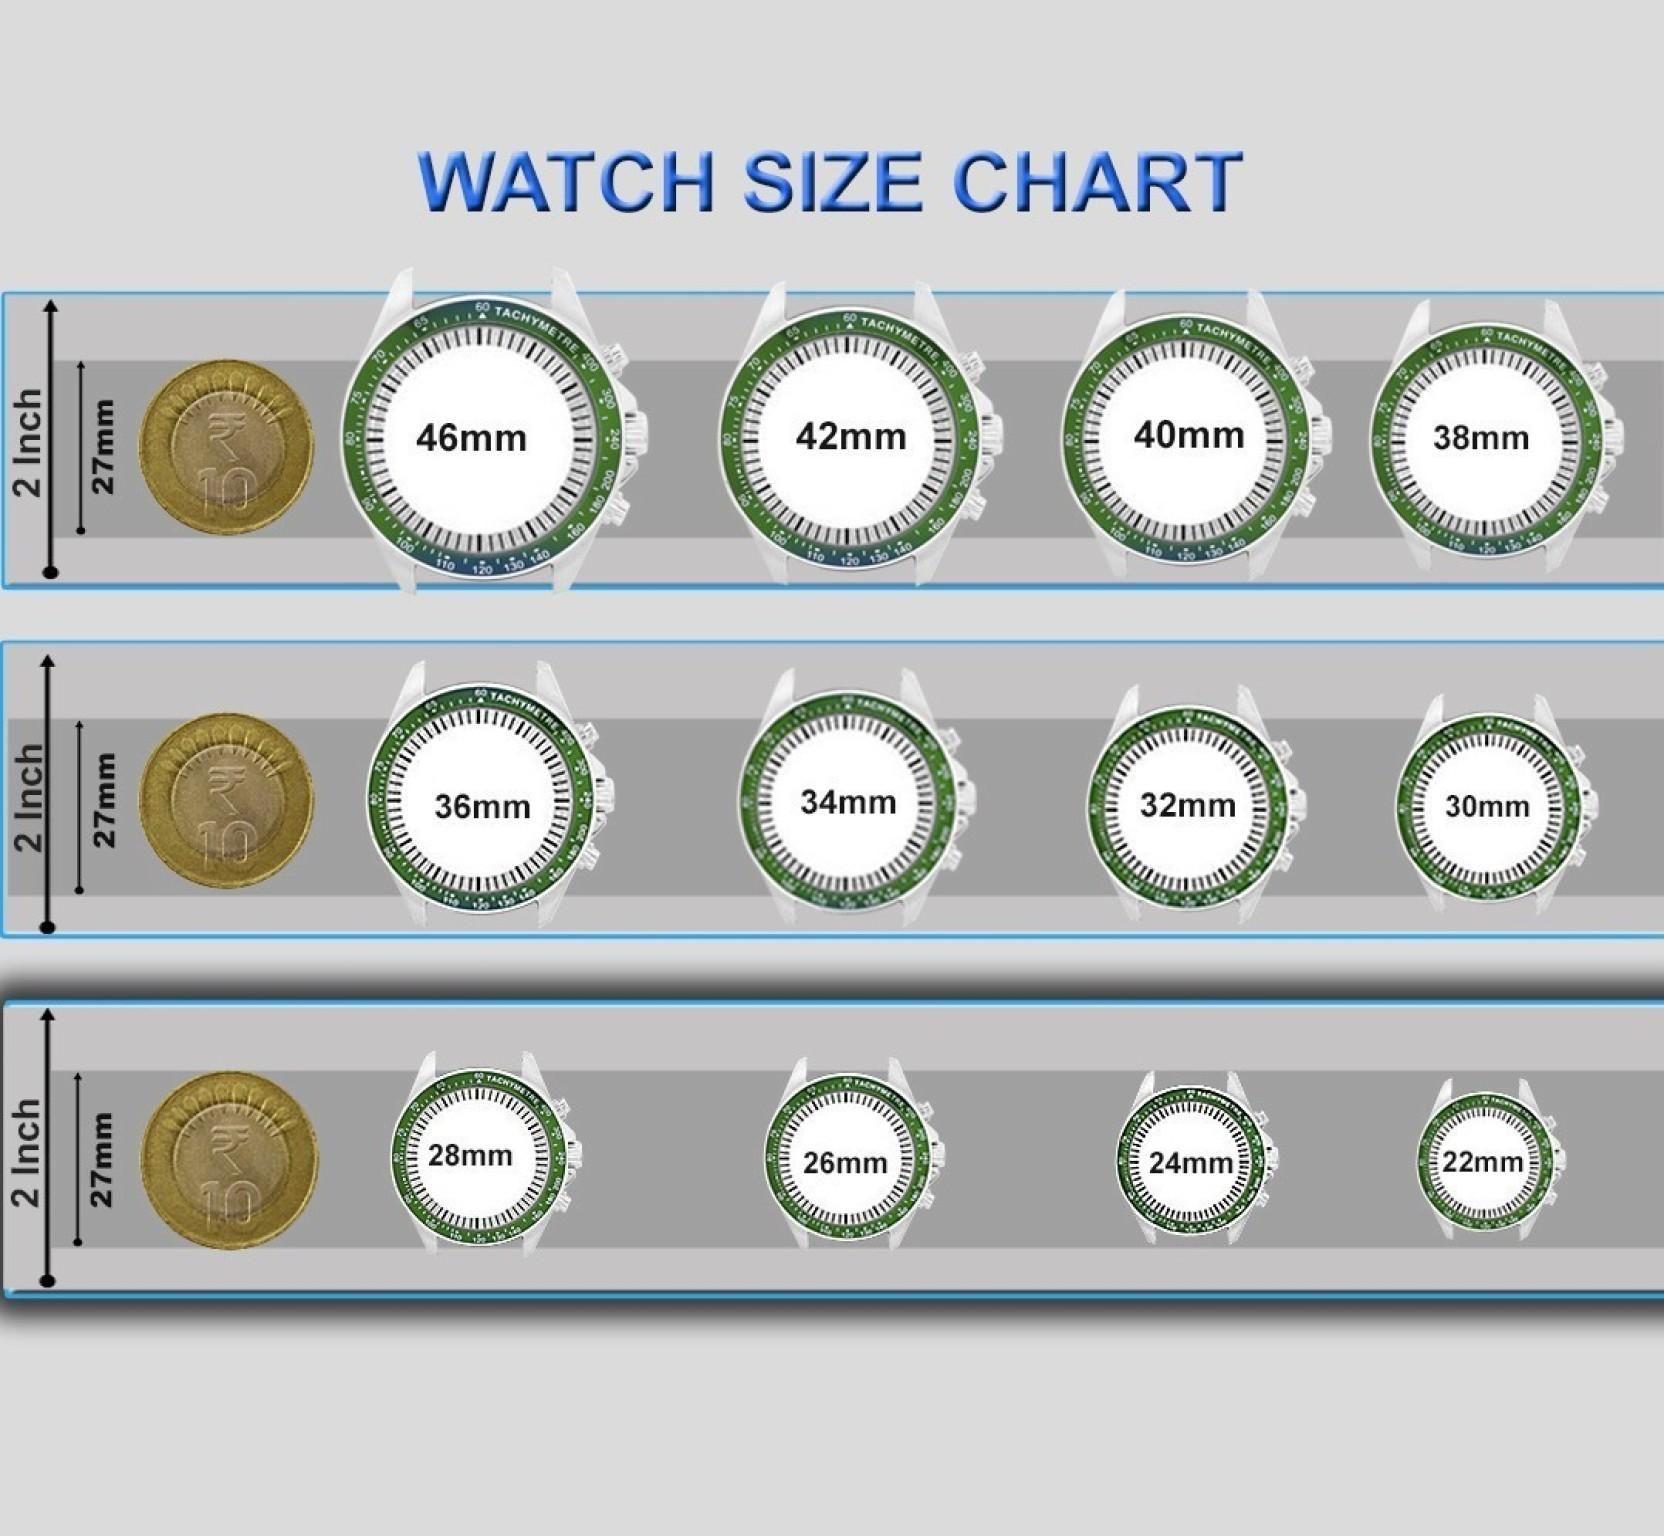 Titan NH1688KM03 Watch - For Men